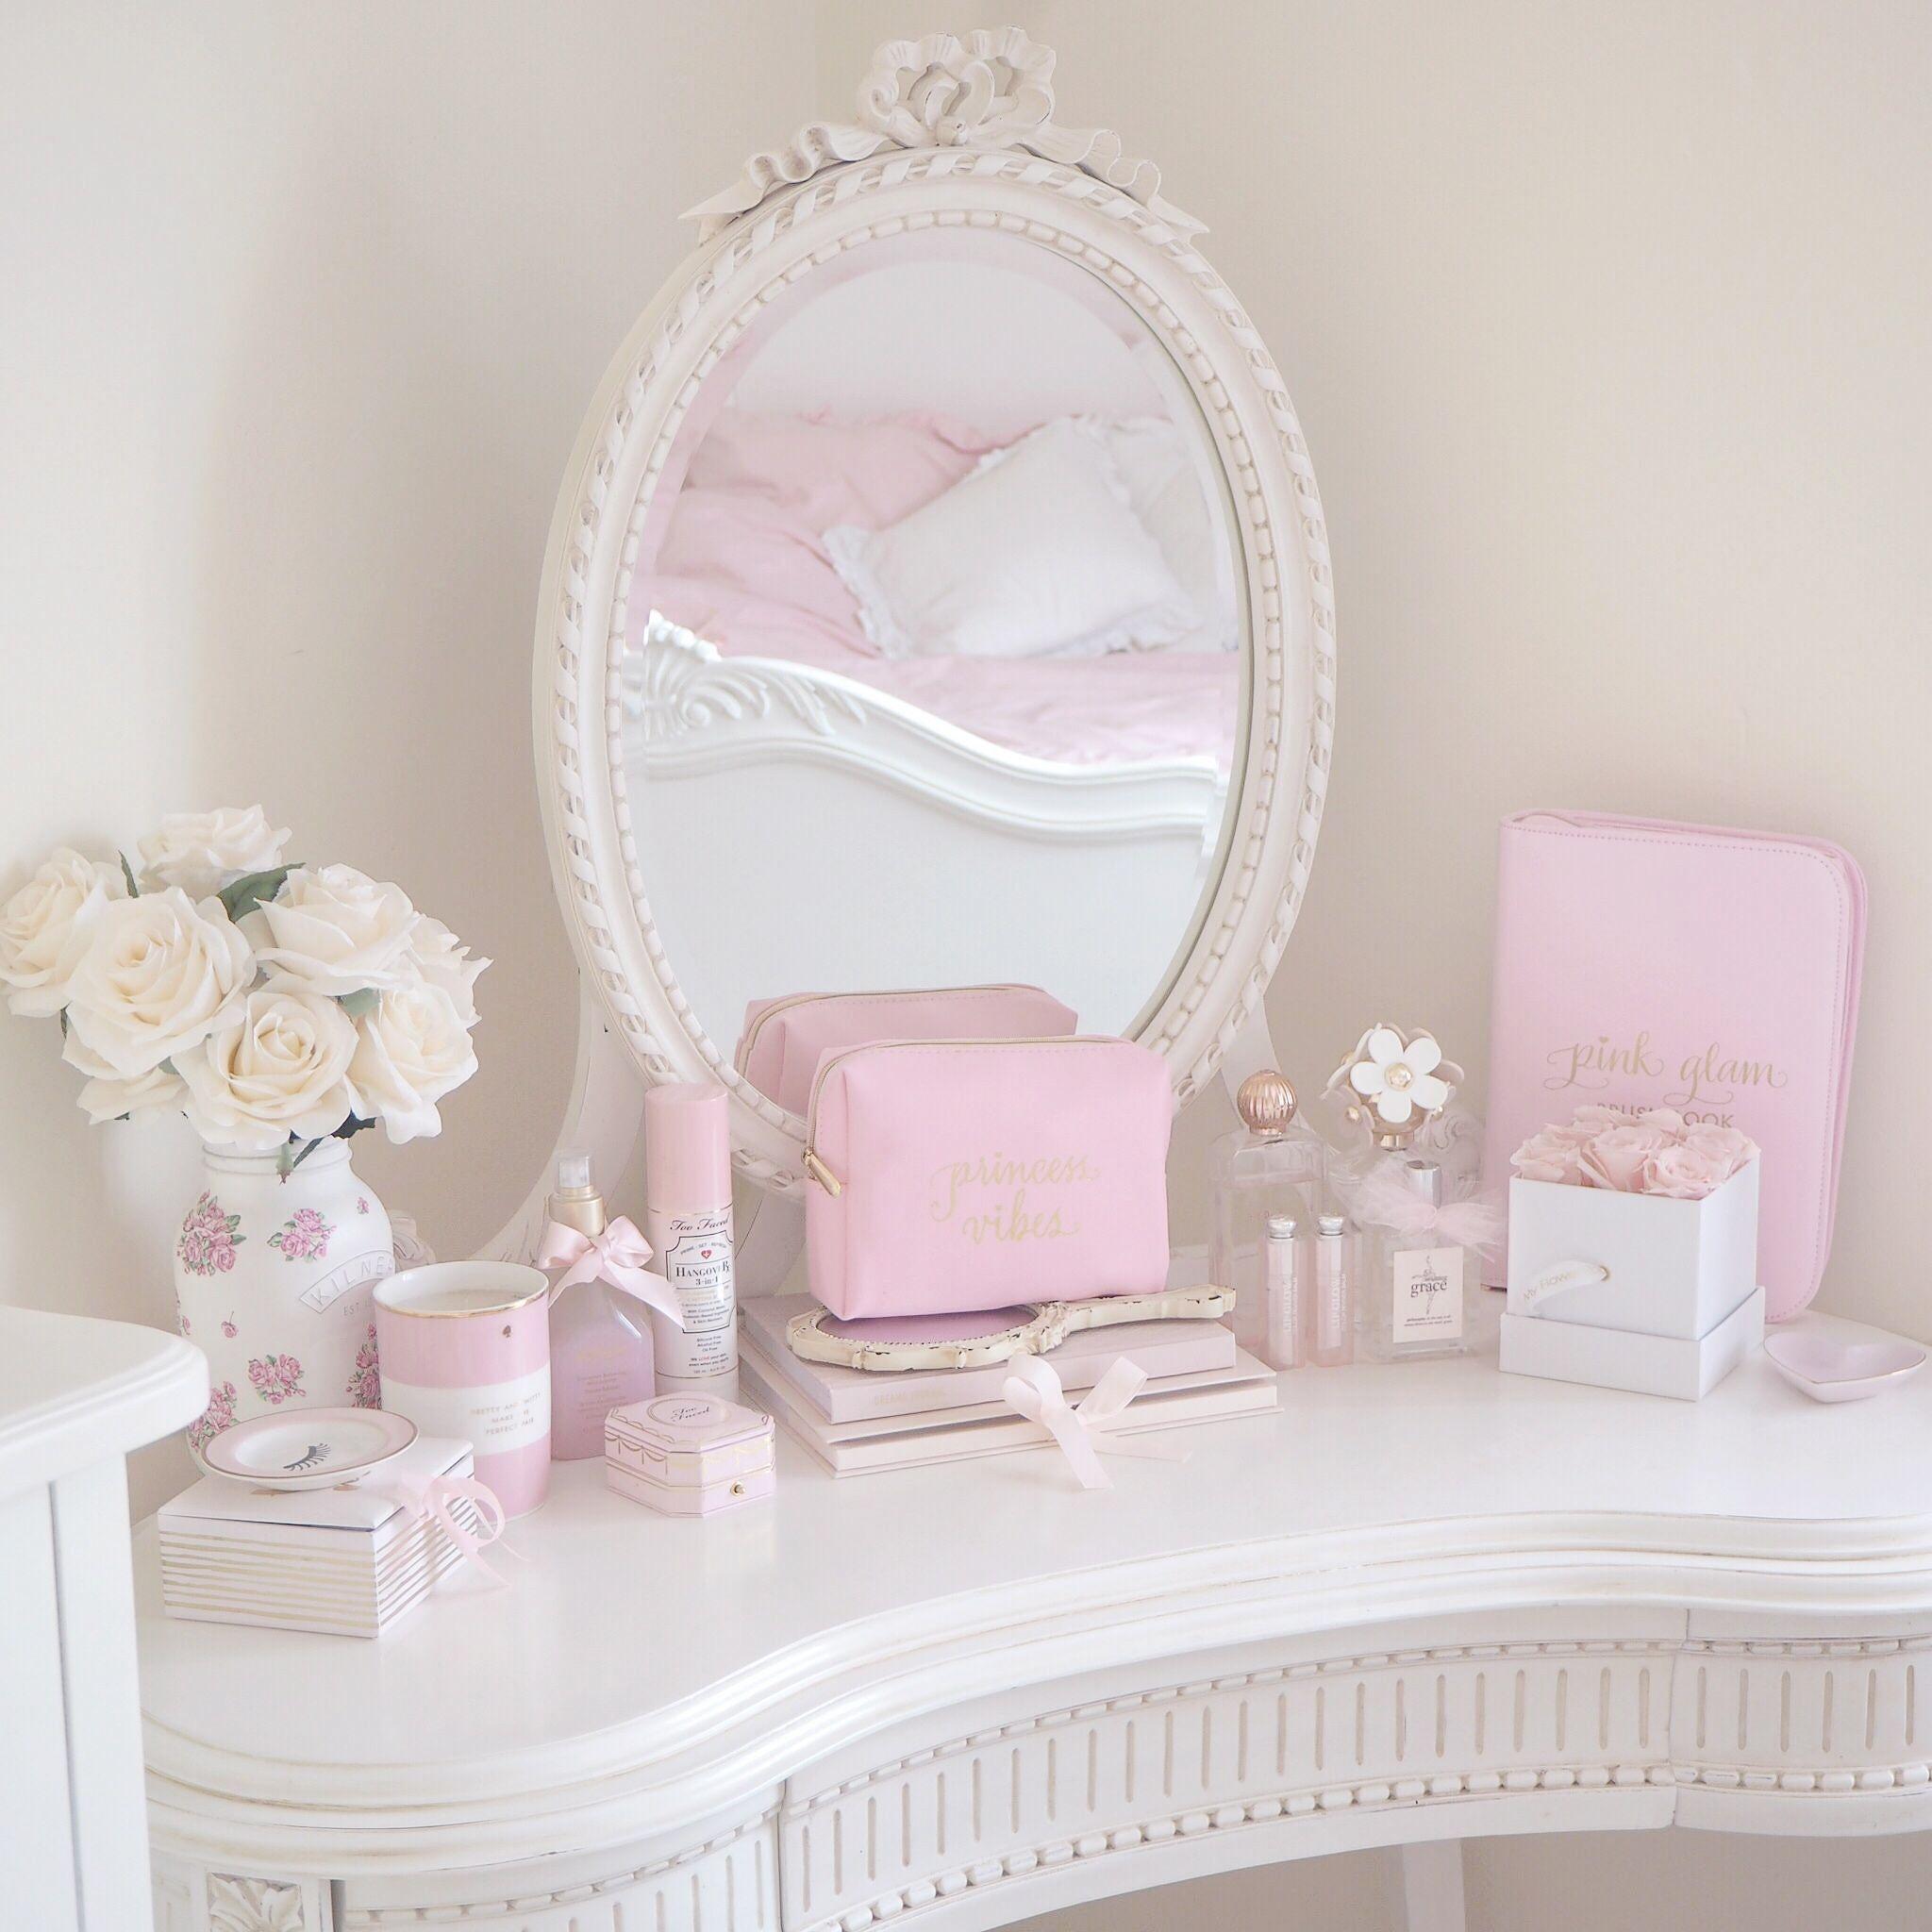 Styling My Princess Dressing Table, Girly Bedroom, Vanity ...